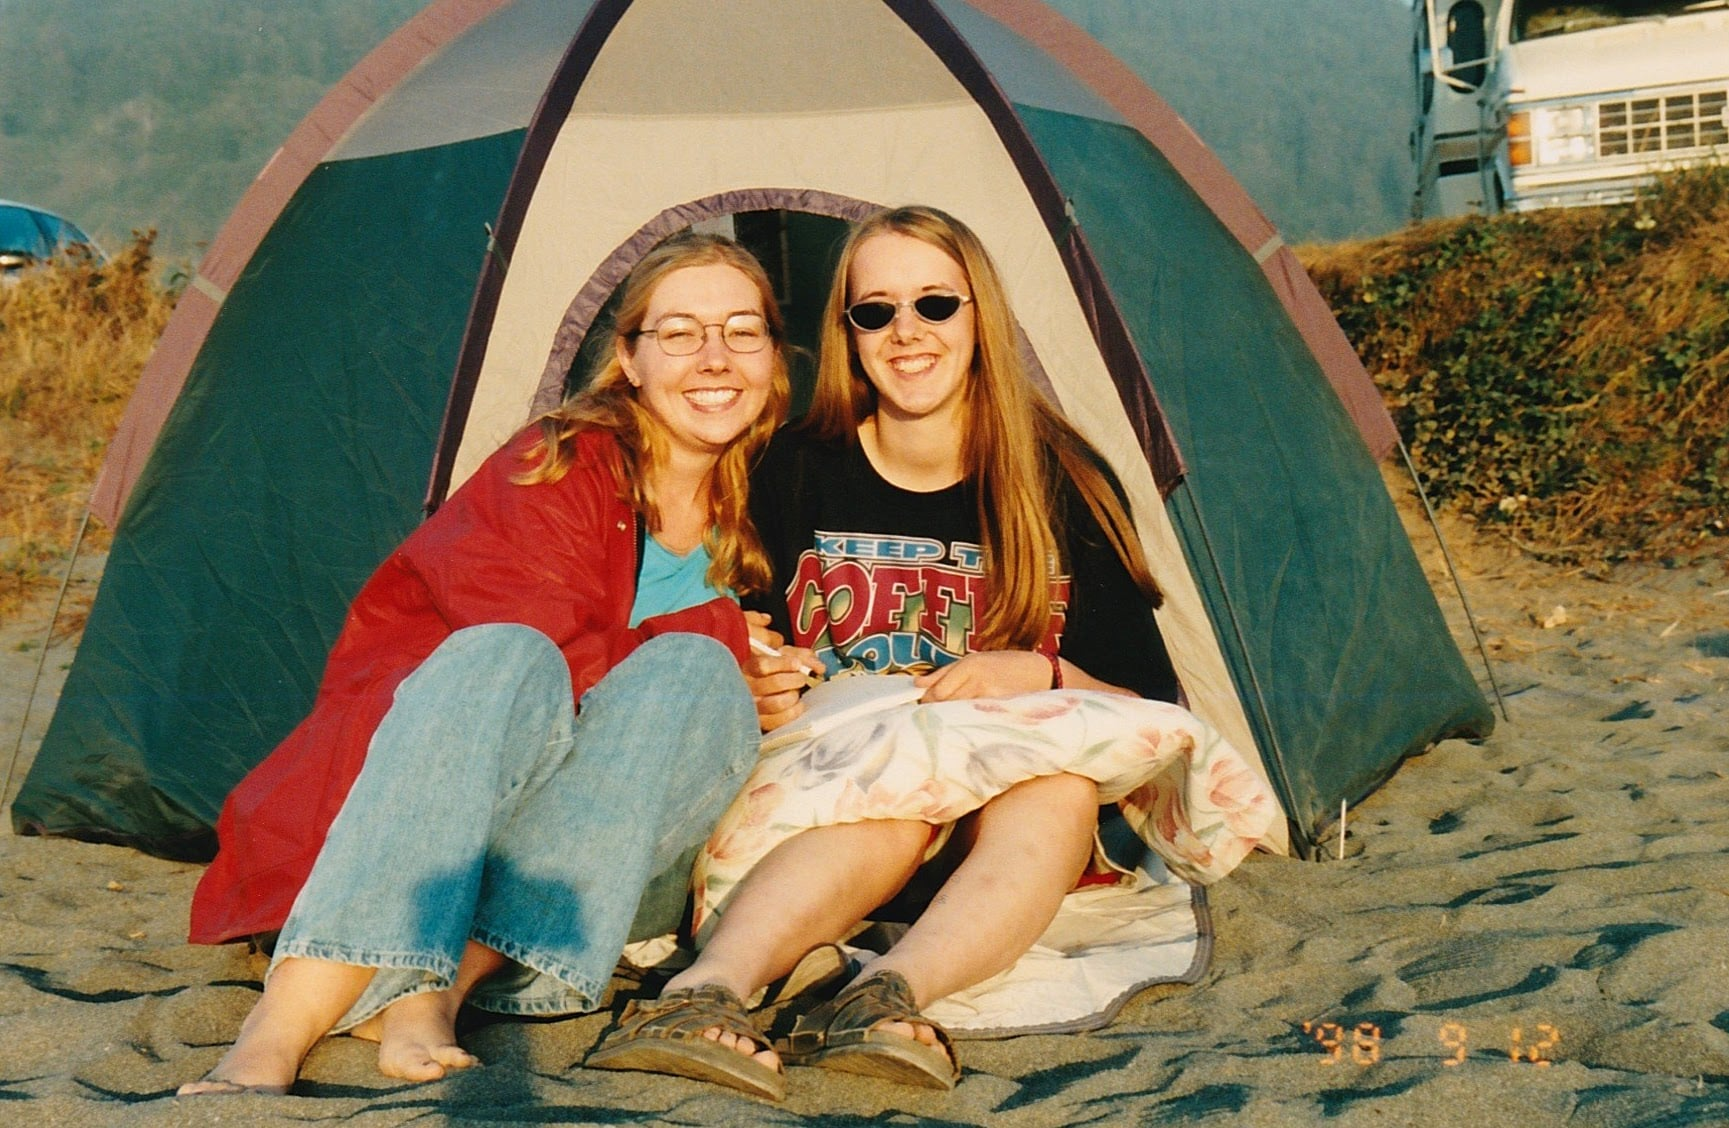 Best friend in a tent on a beach